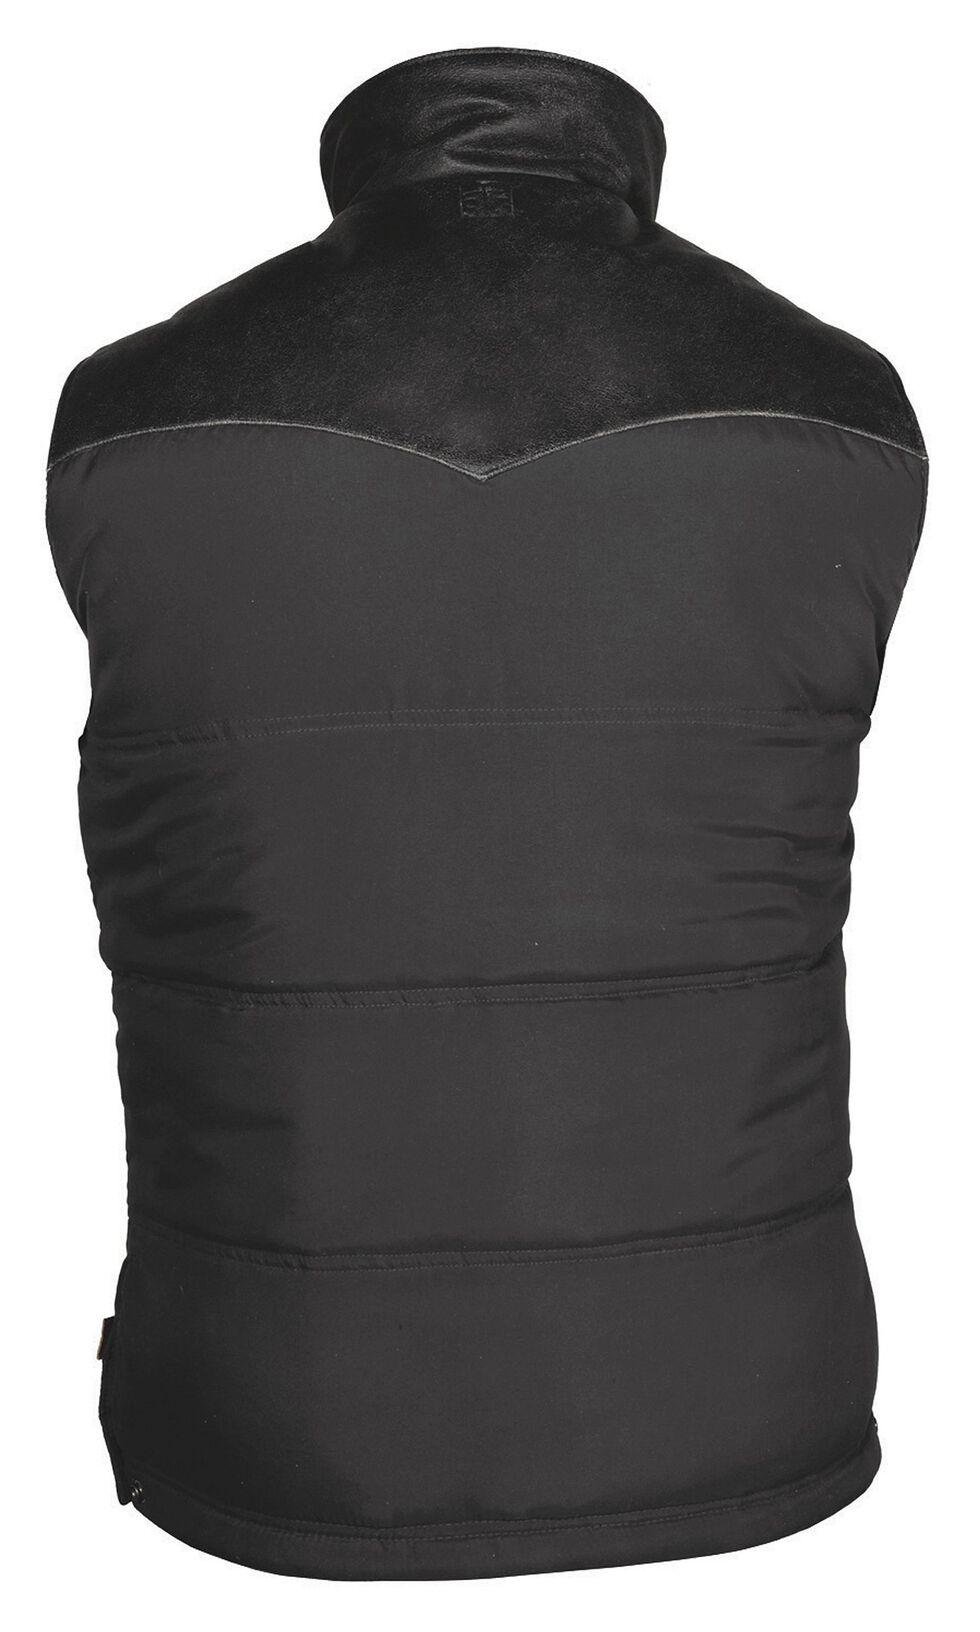 STS Ranchwear Men's Lucas Down Style Black Vest - Big & Tall - 4XL, Black, hi-res